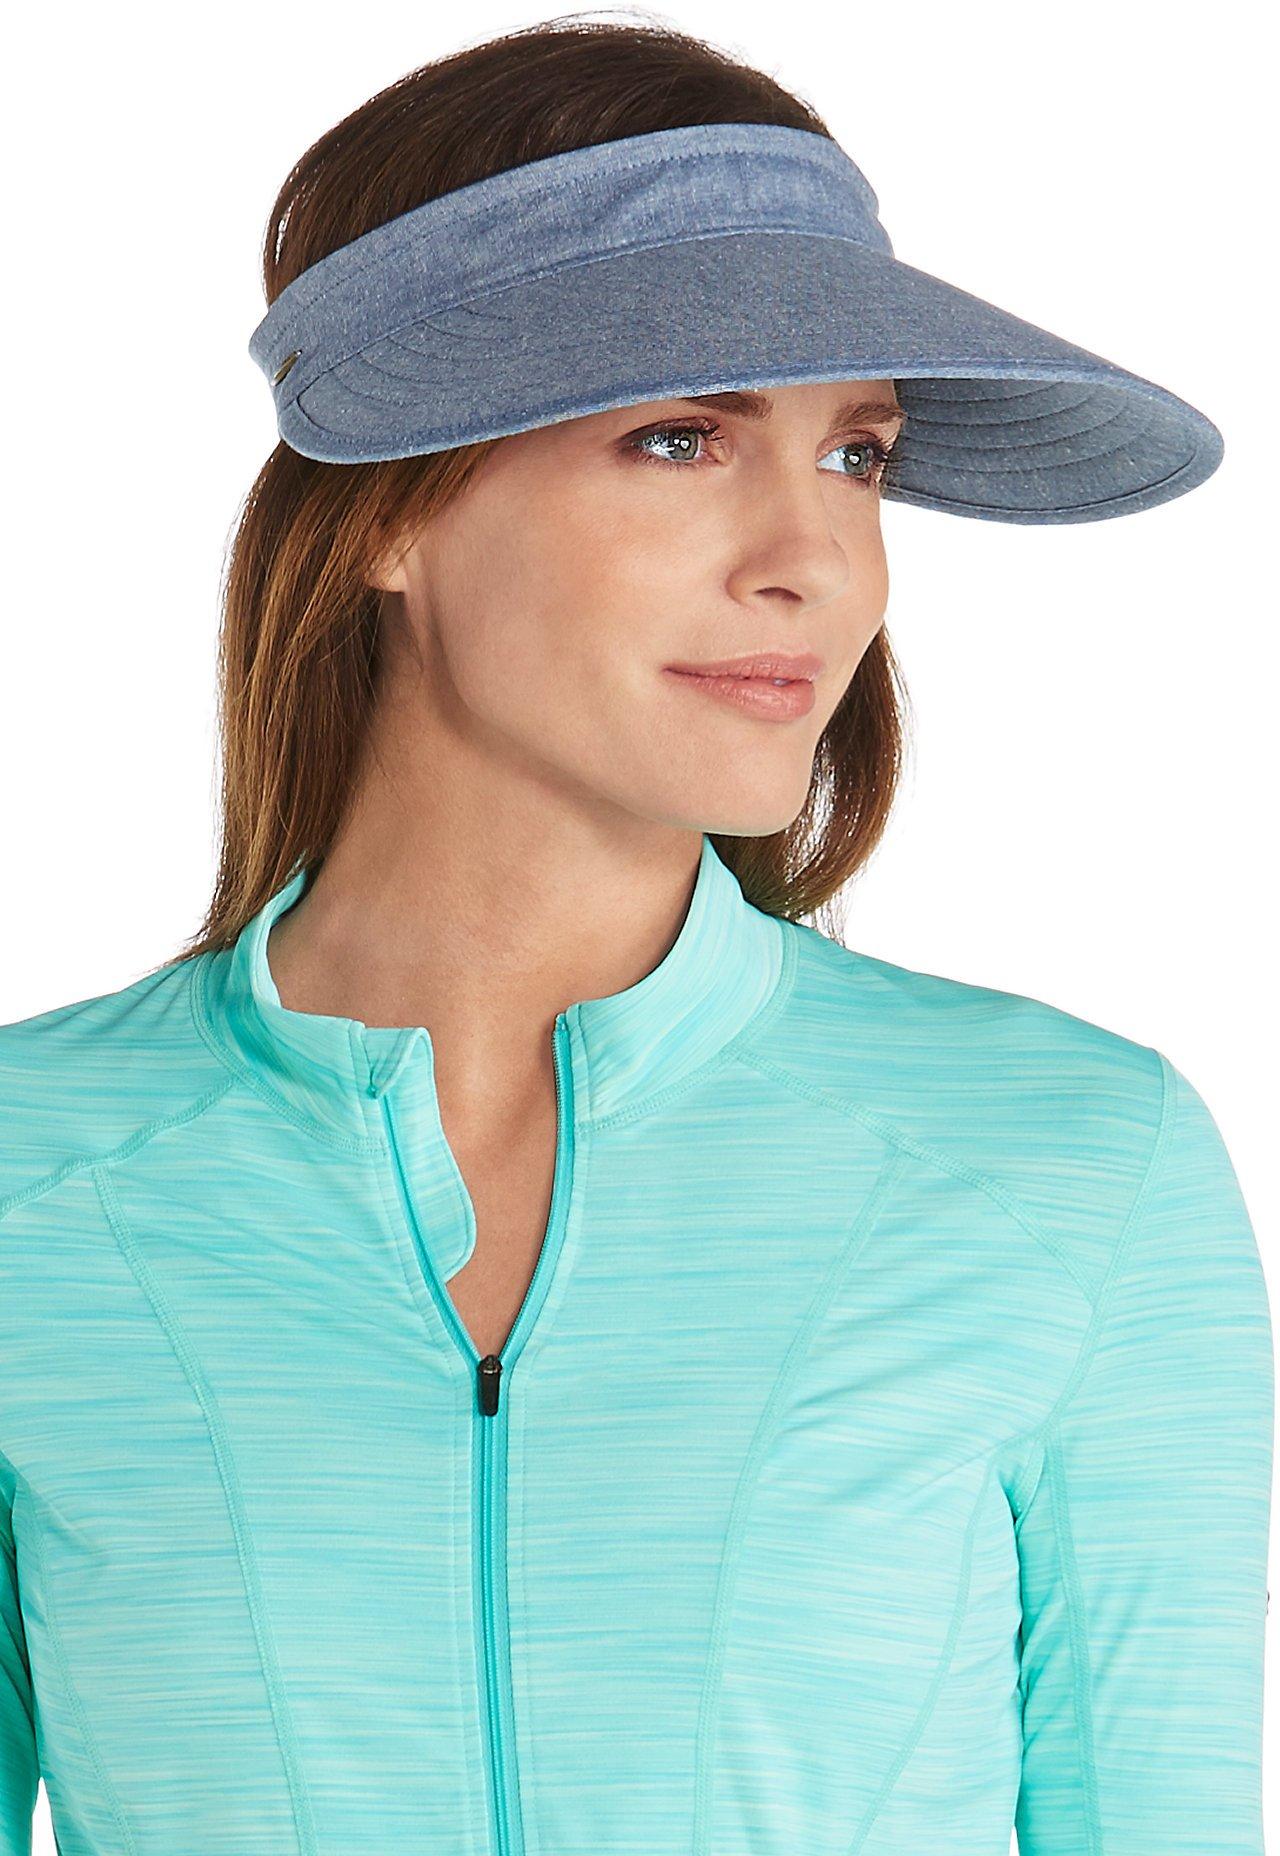 Coolibar UPF 50+ Women's Bel Aire Zip-Off Sun Visor - Sun Protective (One Size- Chambray)